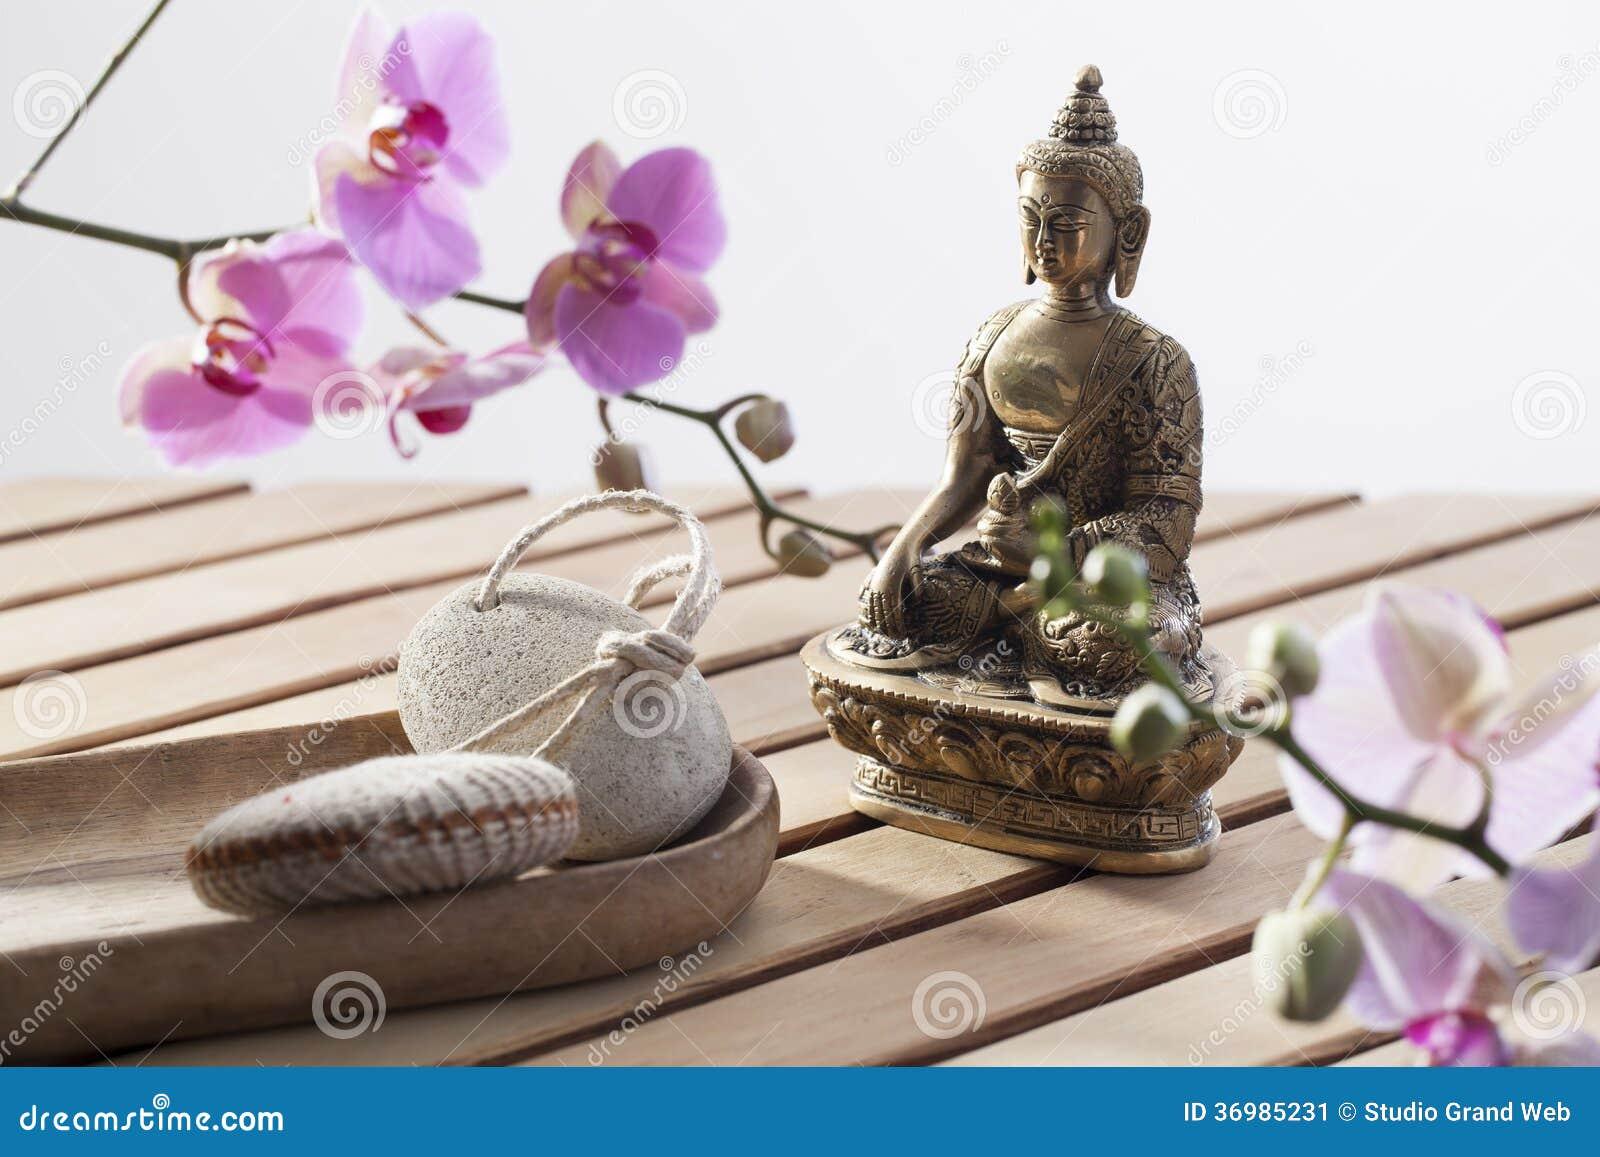 Simbolo di cultura asiatica per bellezza interna